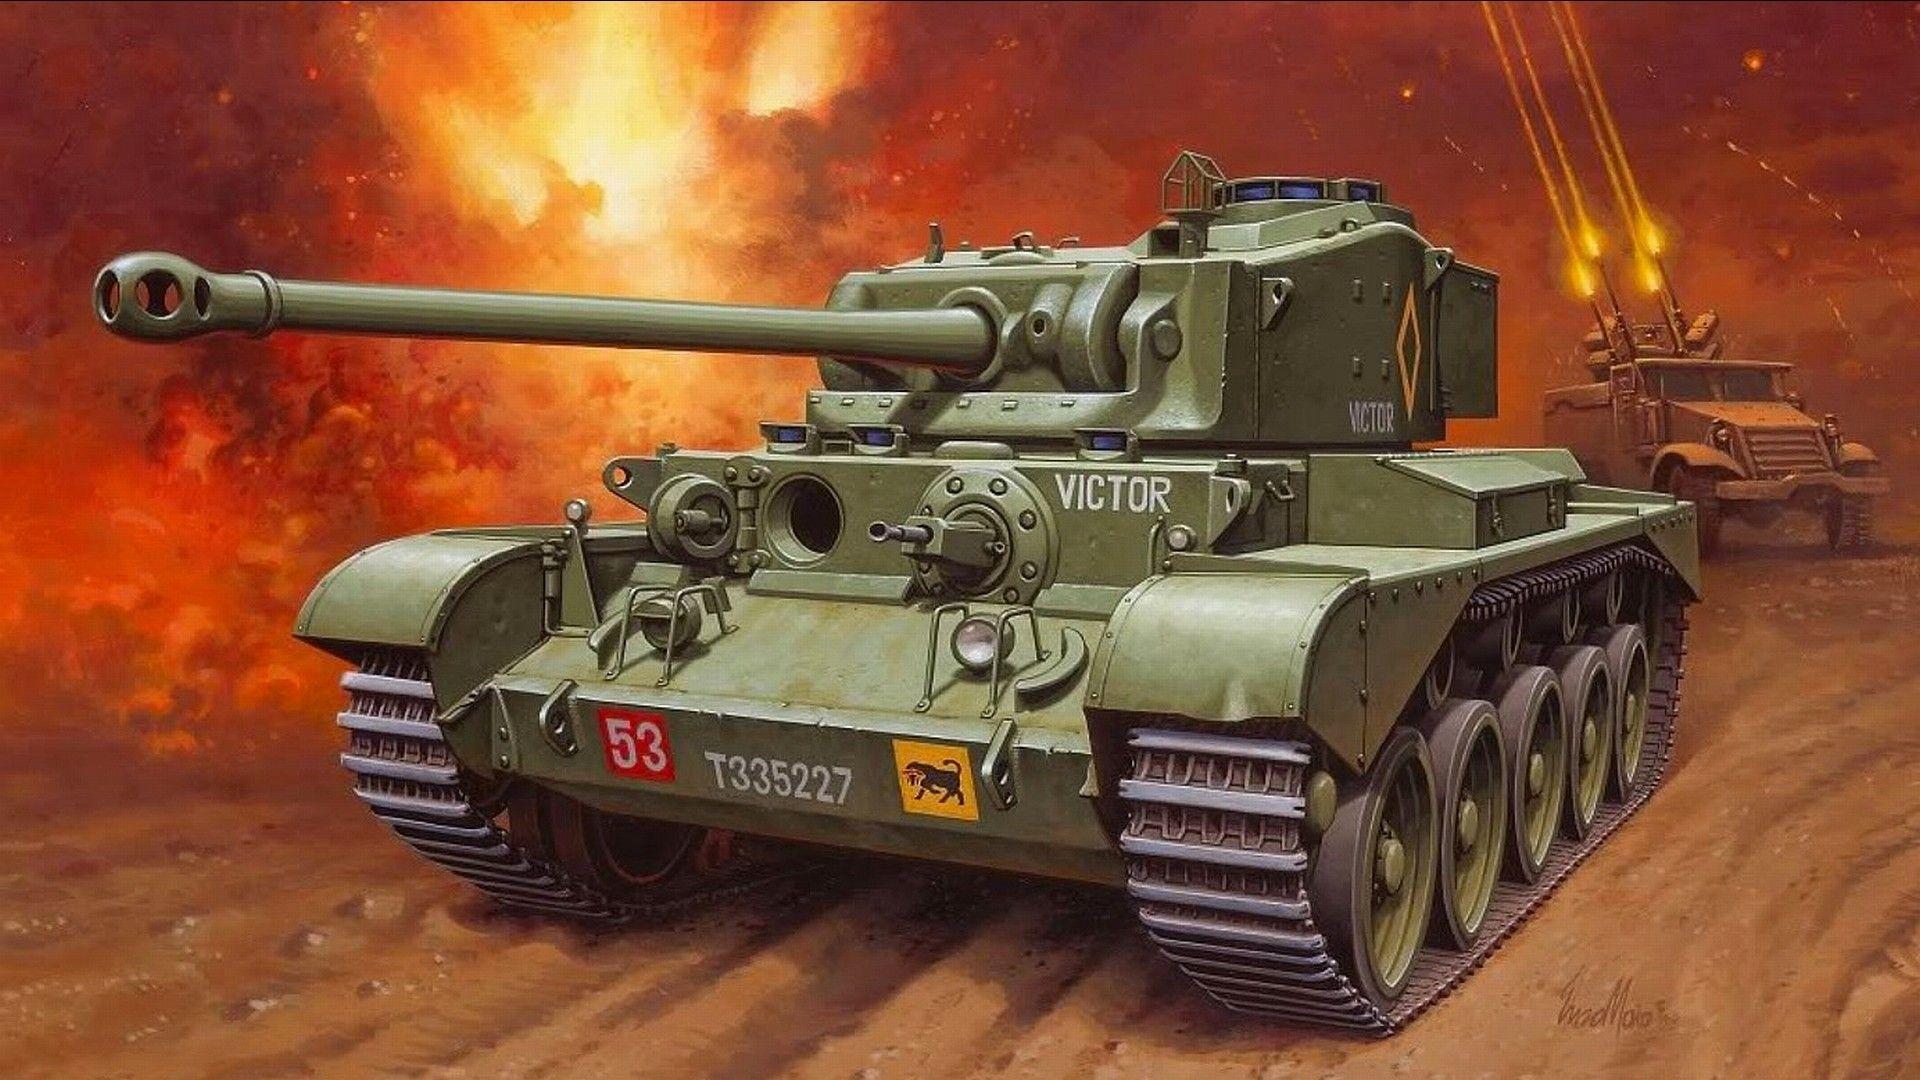 Army Tank Desktop Wallpapers Top Free Army Tank Desktop Backgrounds Wallpaperaccess